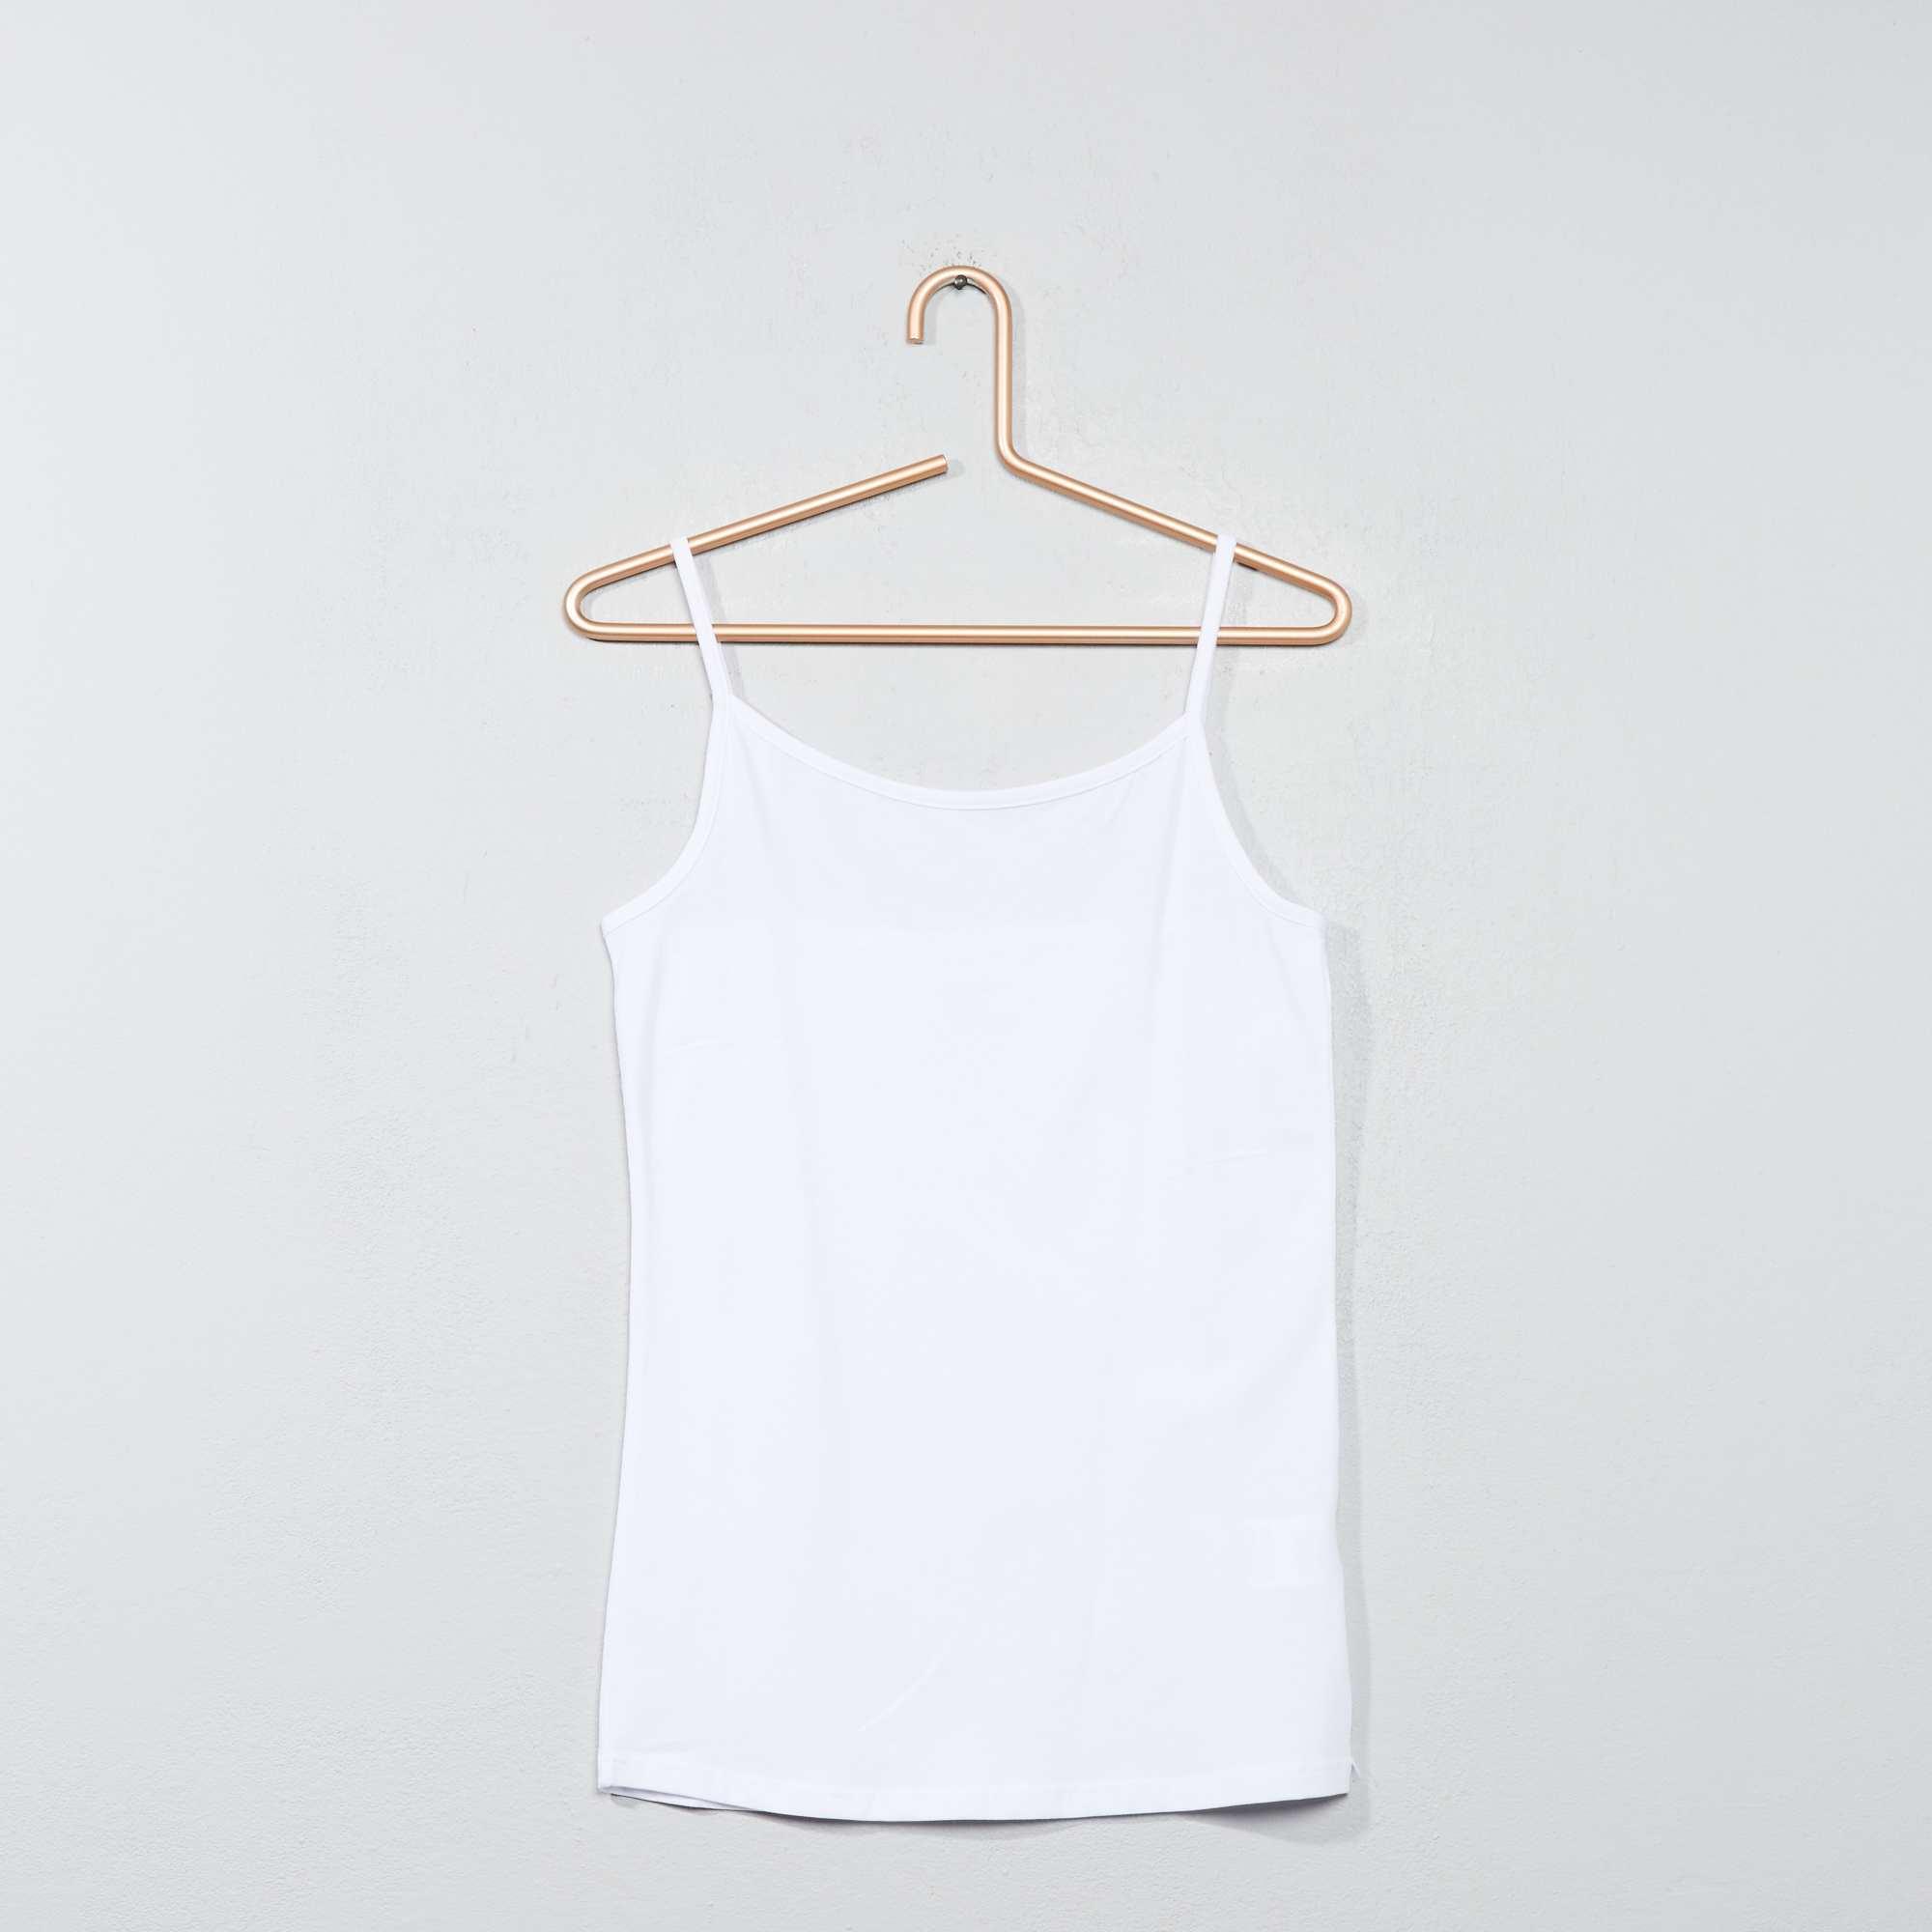 236cea0cfec0 Camiseta de tirantes finos Joven niña - blanco - Kiabi - 3,00€